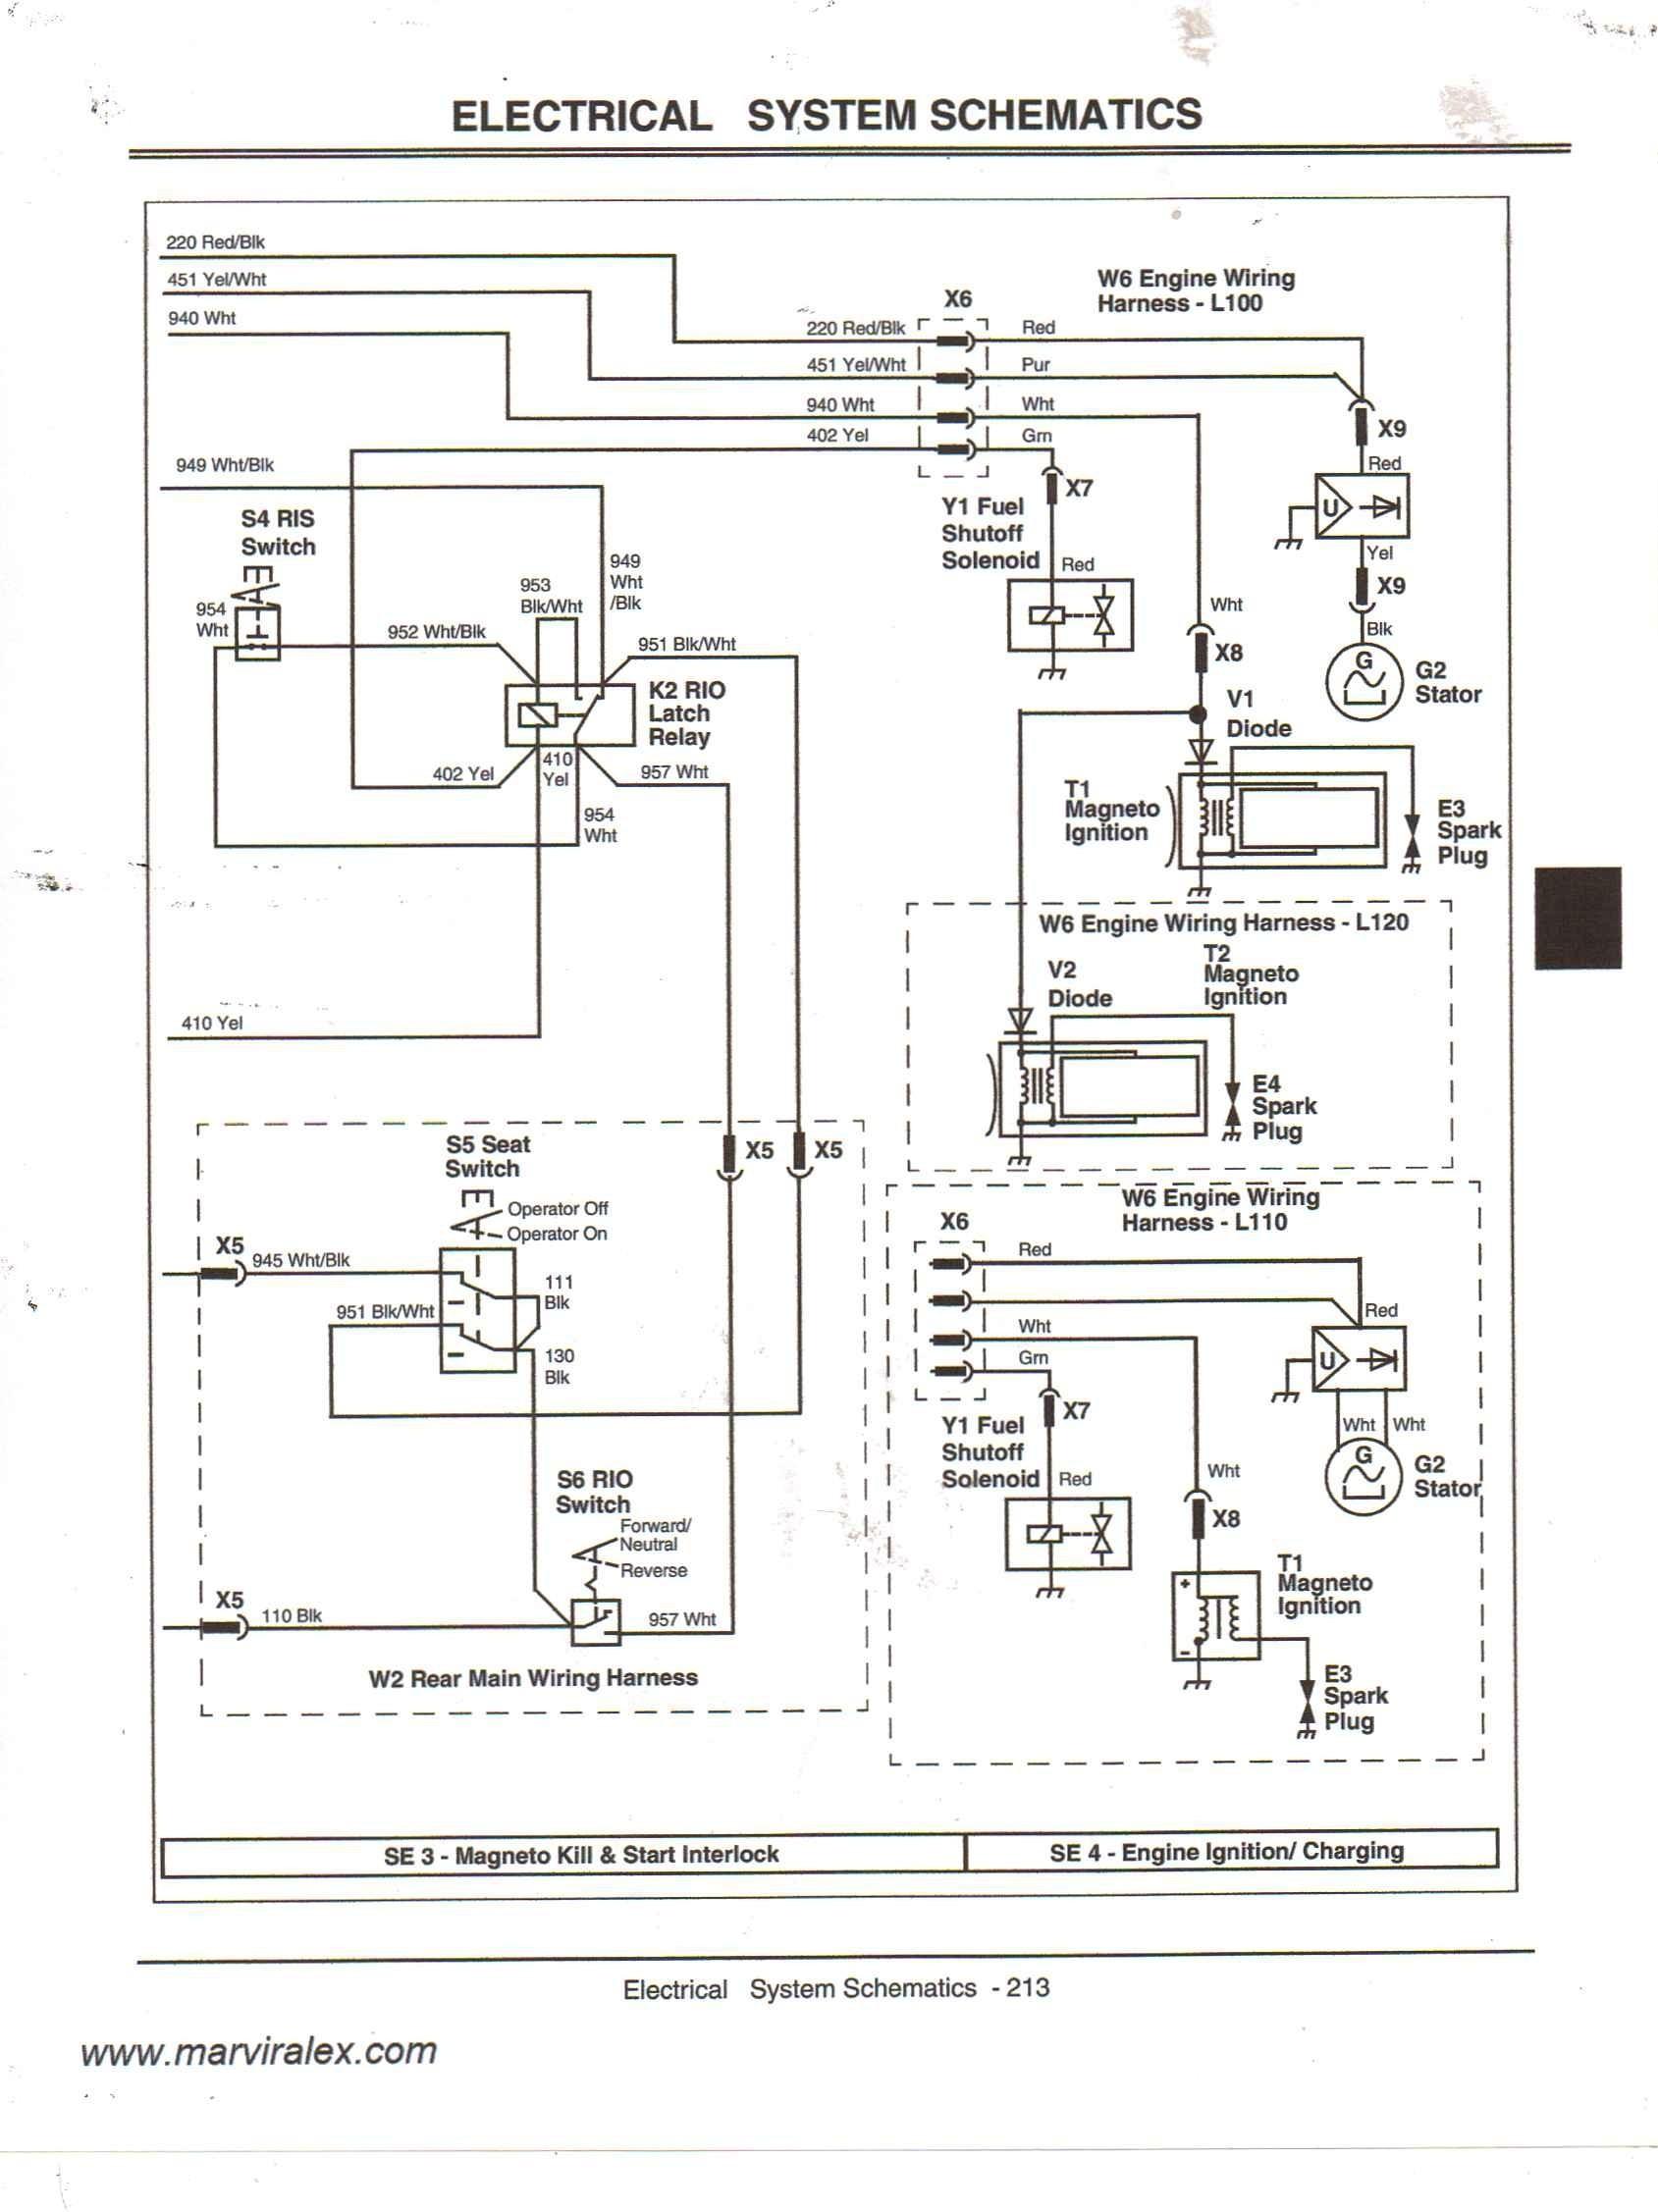 Electrical Schematic 345 John Deere Tractor Nd 2800] Wiring Diagram John Deere F525 Also John Deere F525 Of Electrical Schematic 345 John Deere Tractor